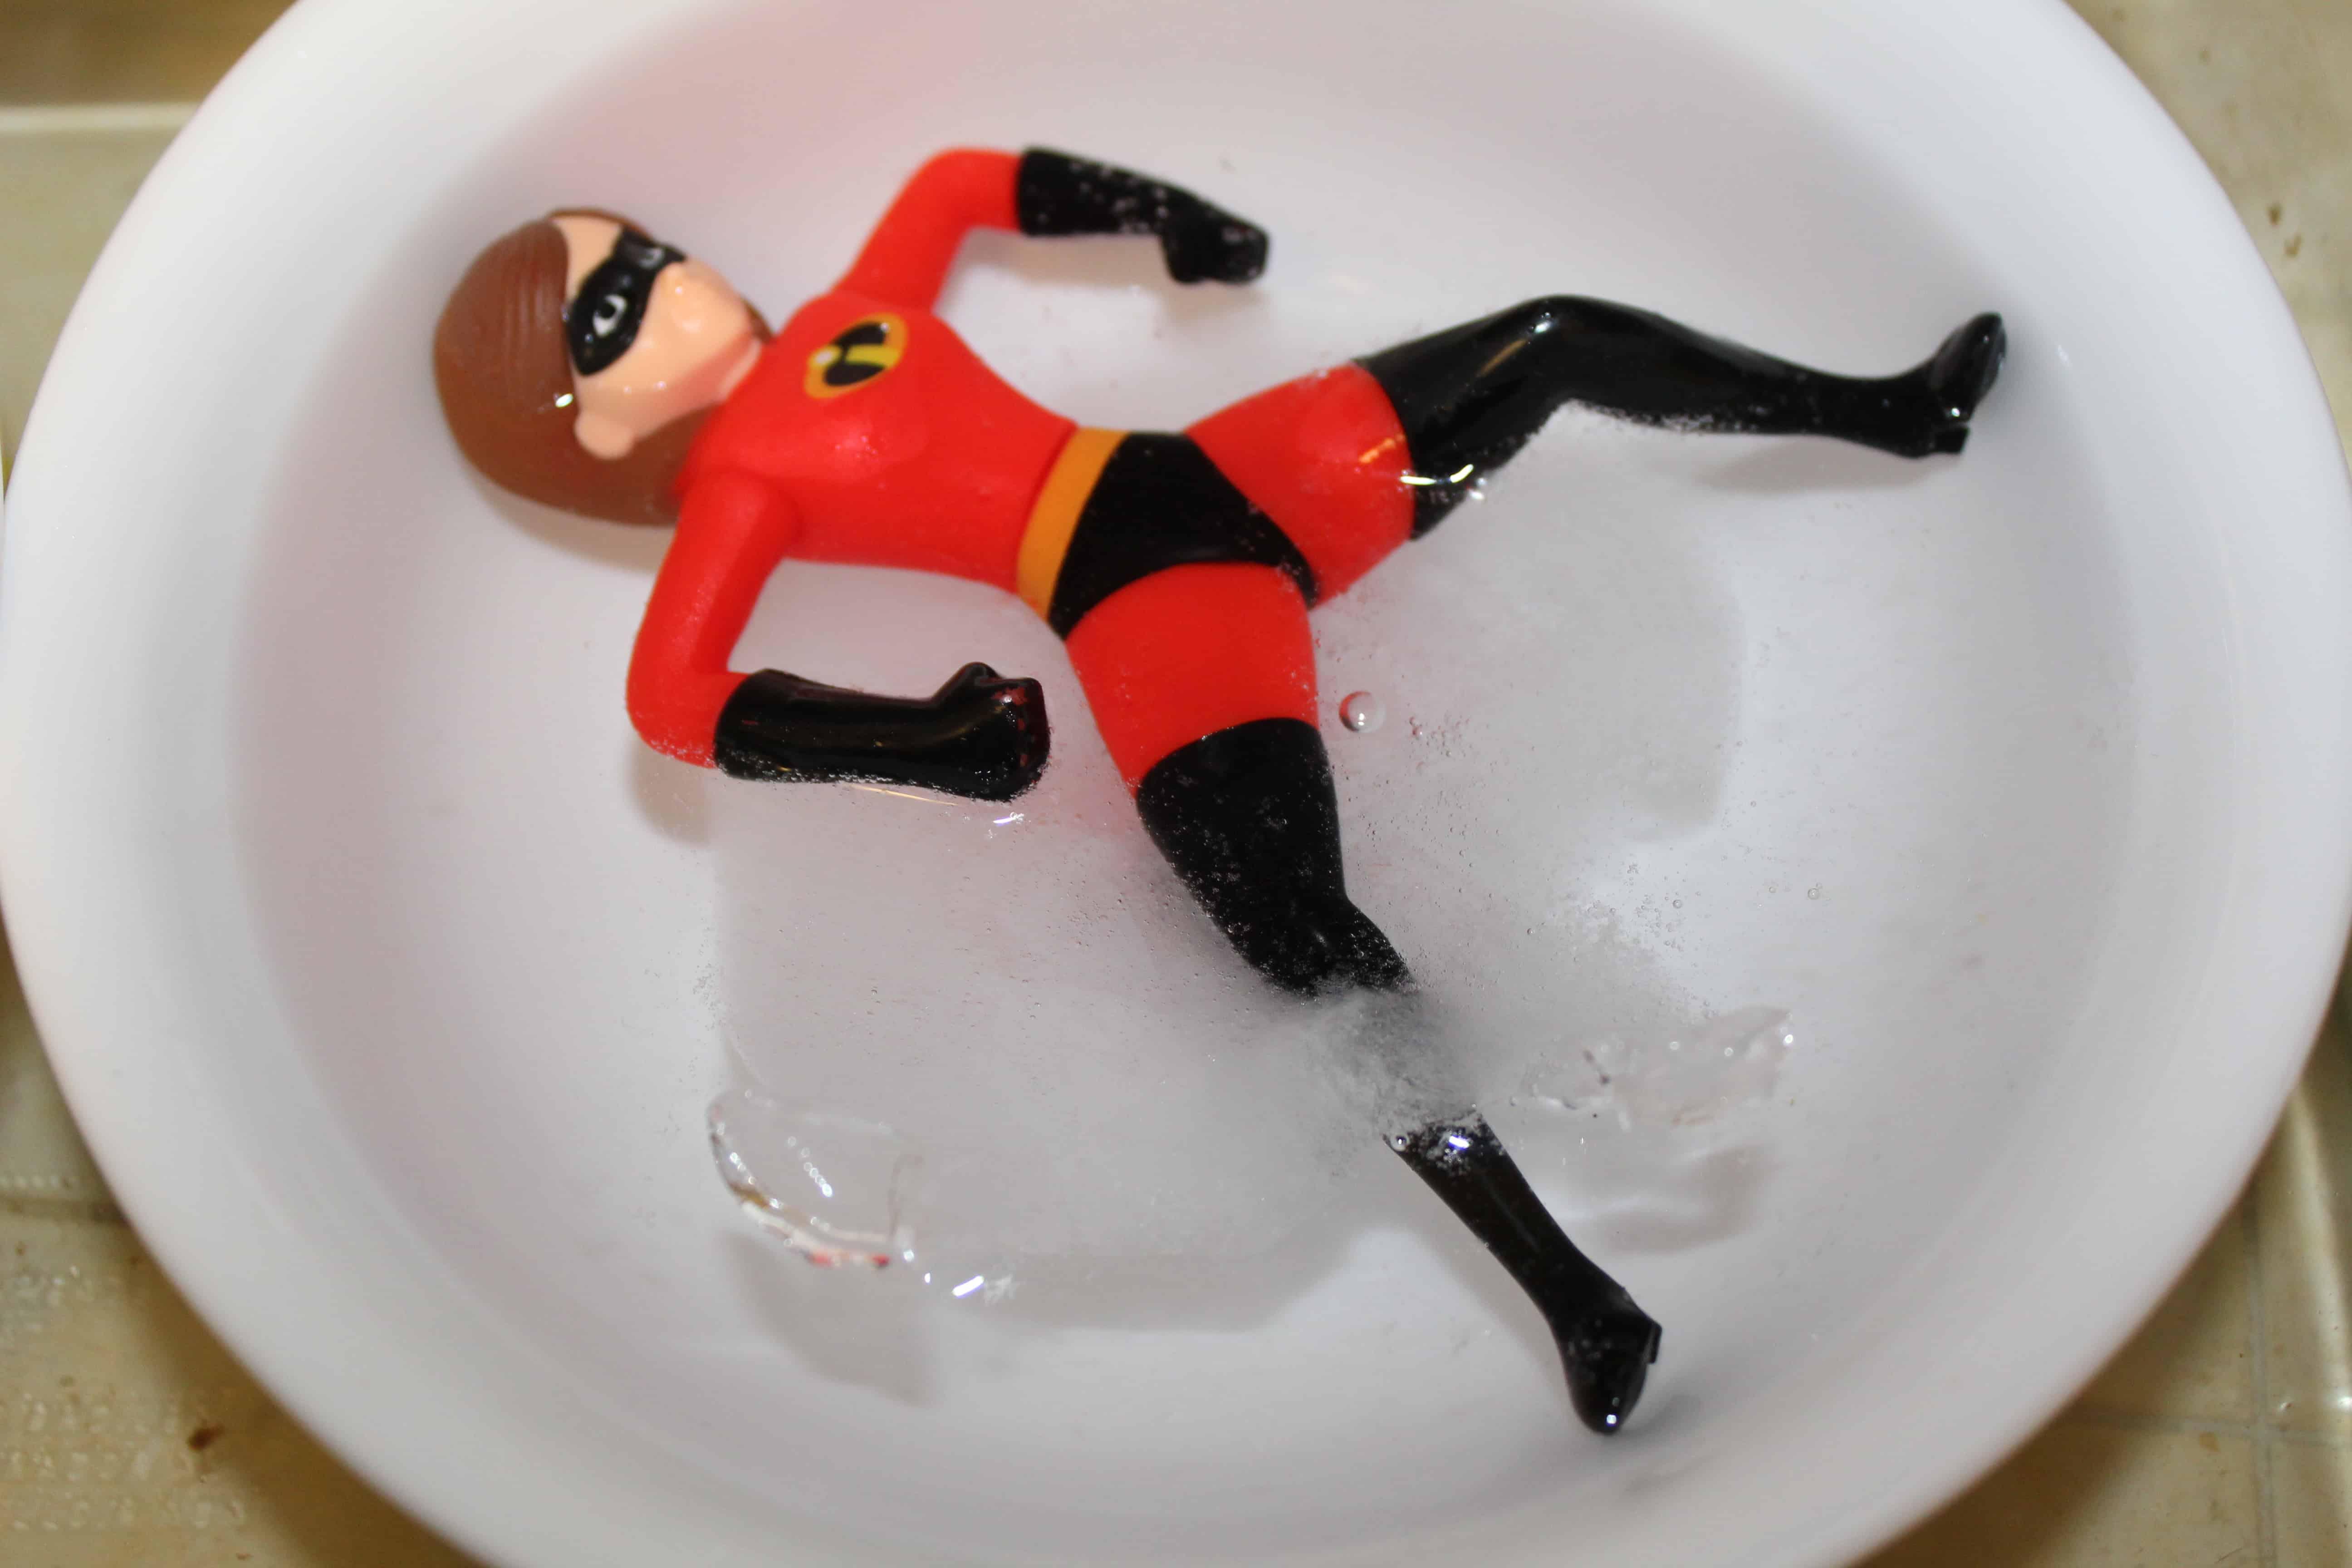 Elastigirl defrosting in a bowl of warm water.